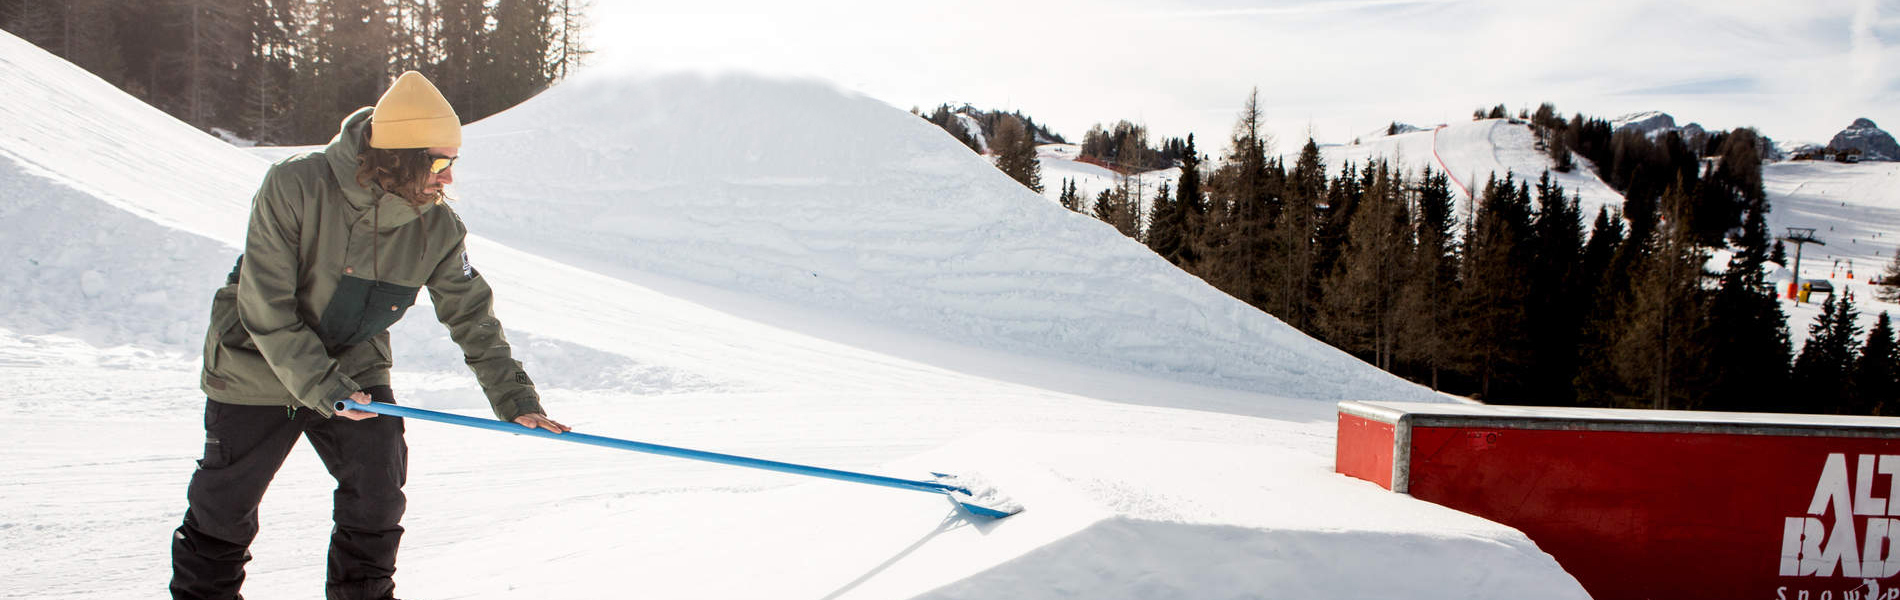 First Line ready – Erstes Wochenend-Setup in Alta Badia